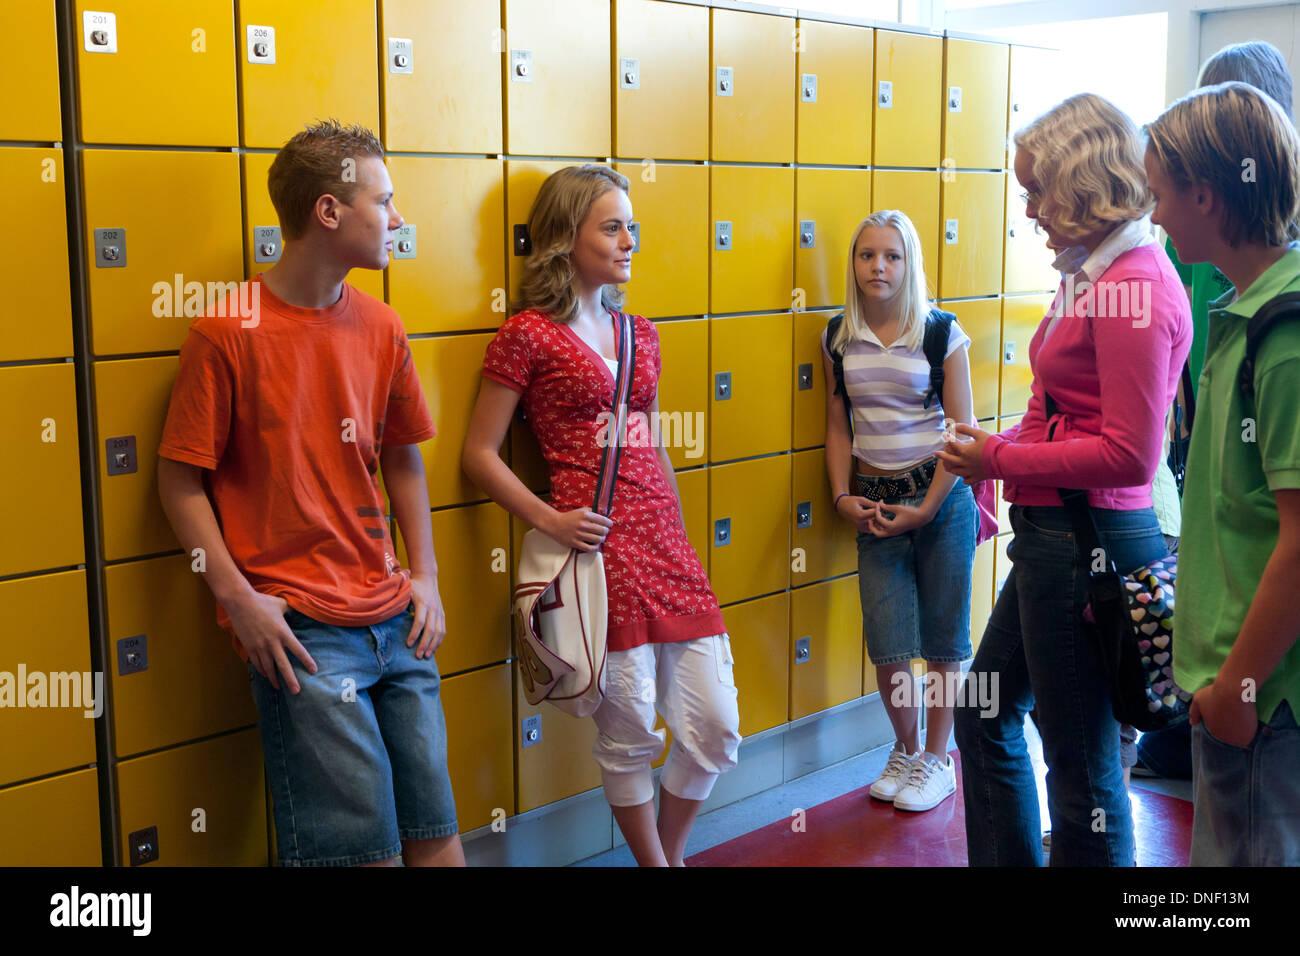 Are Girls group locker room